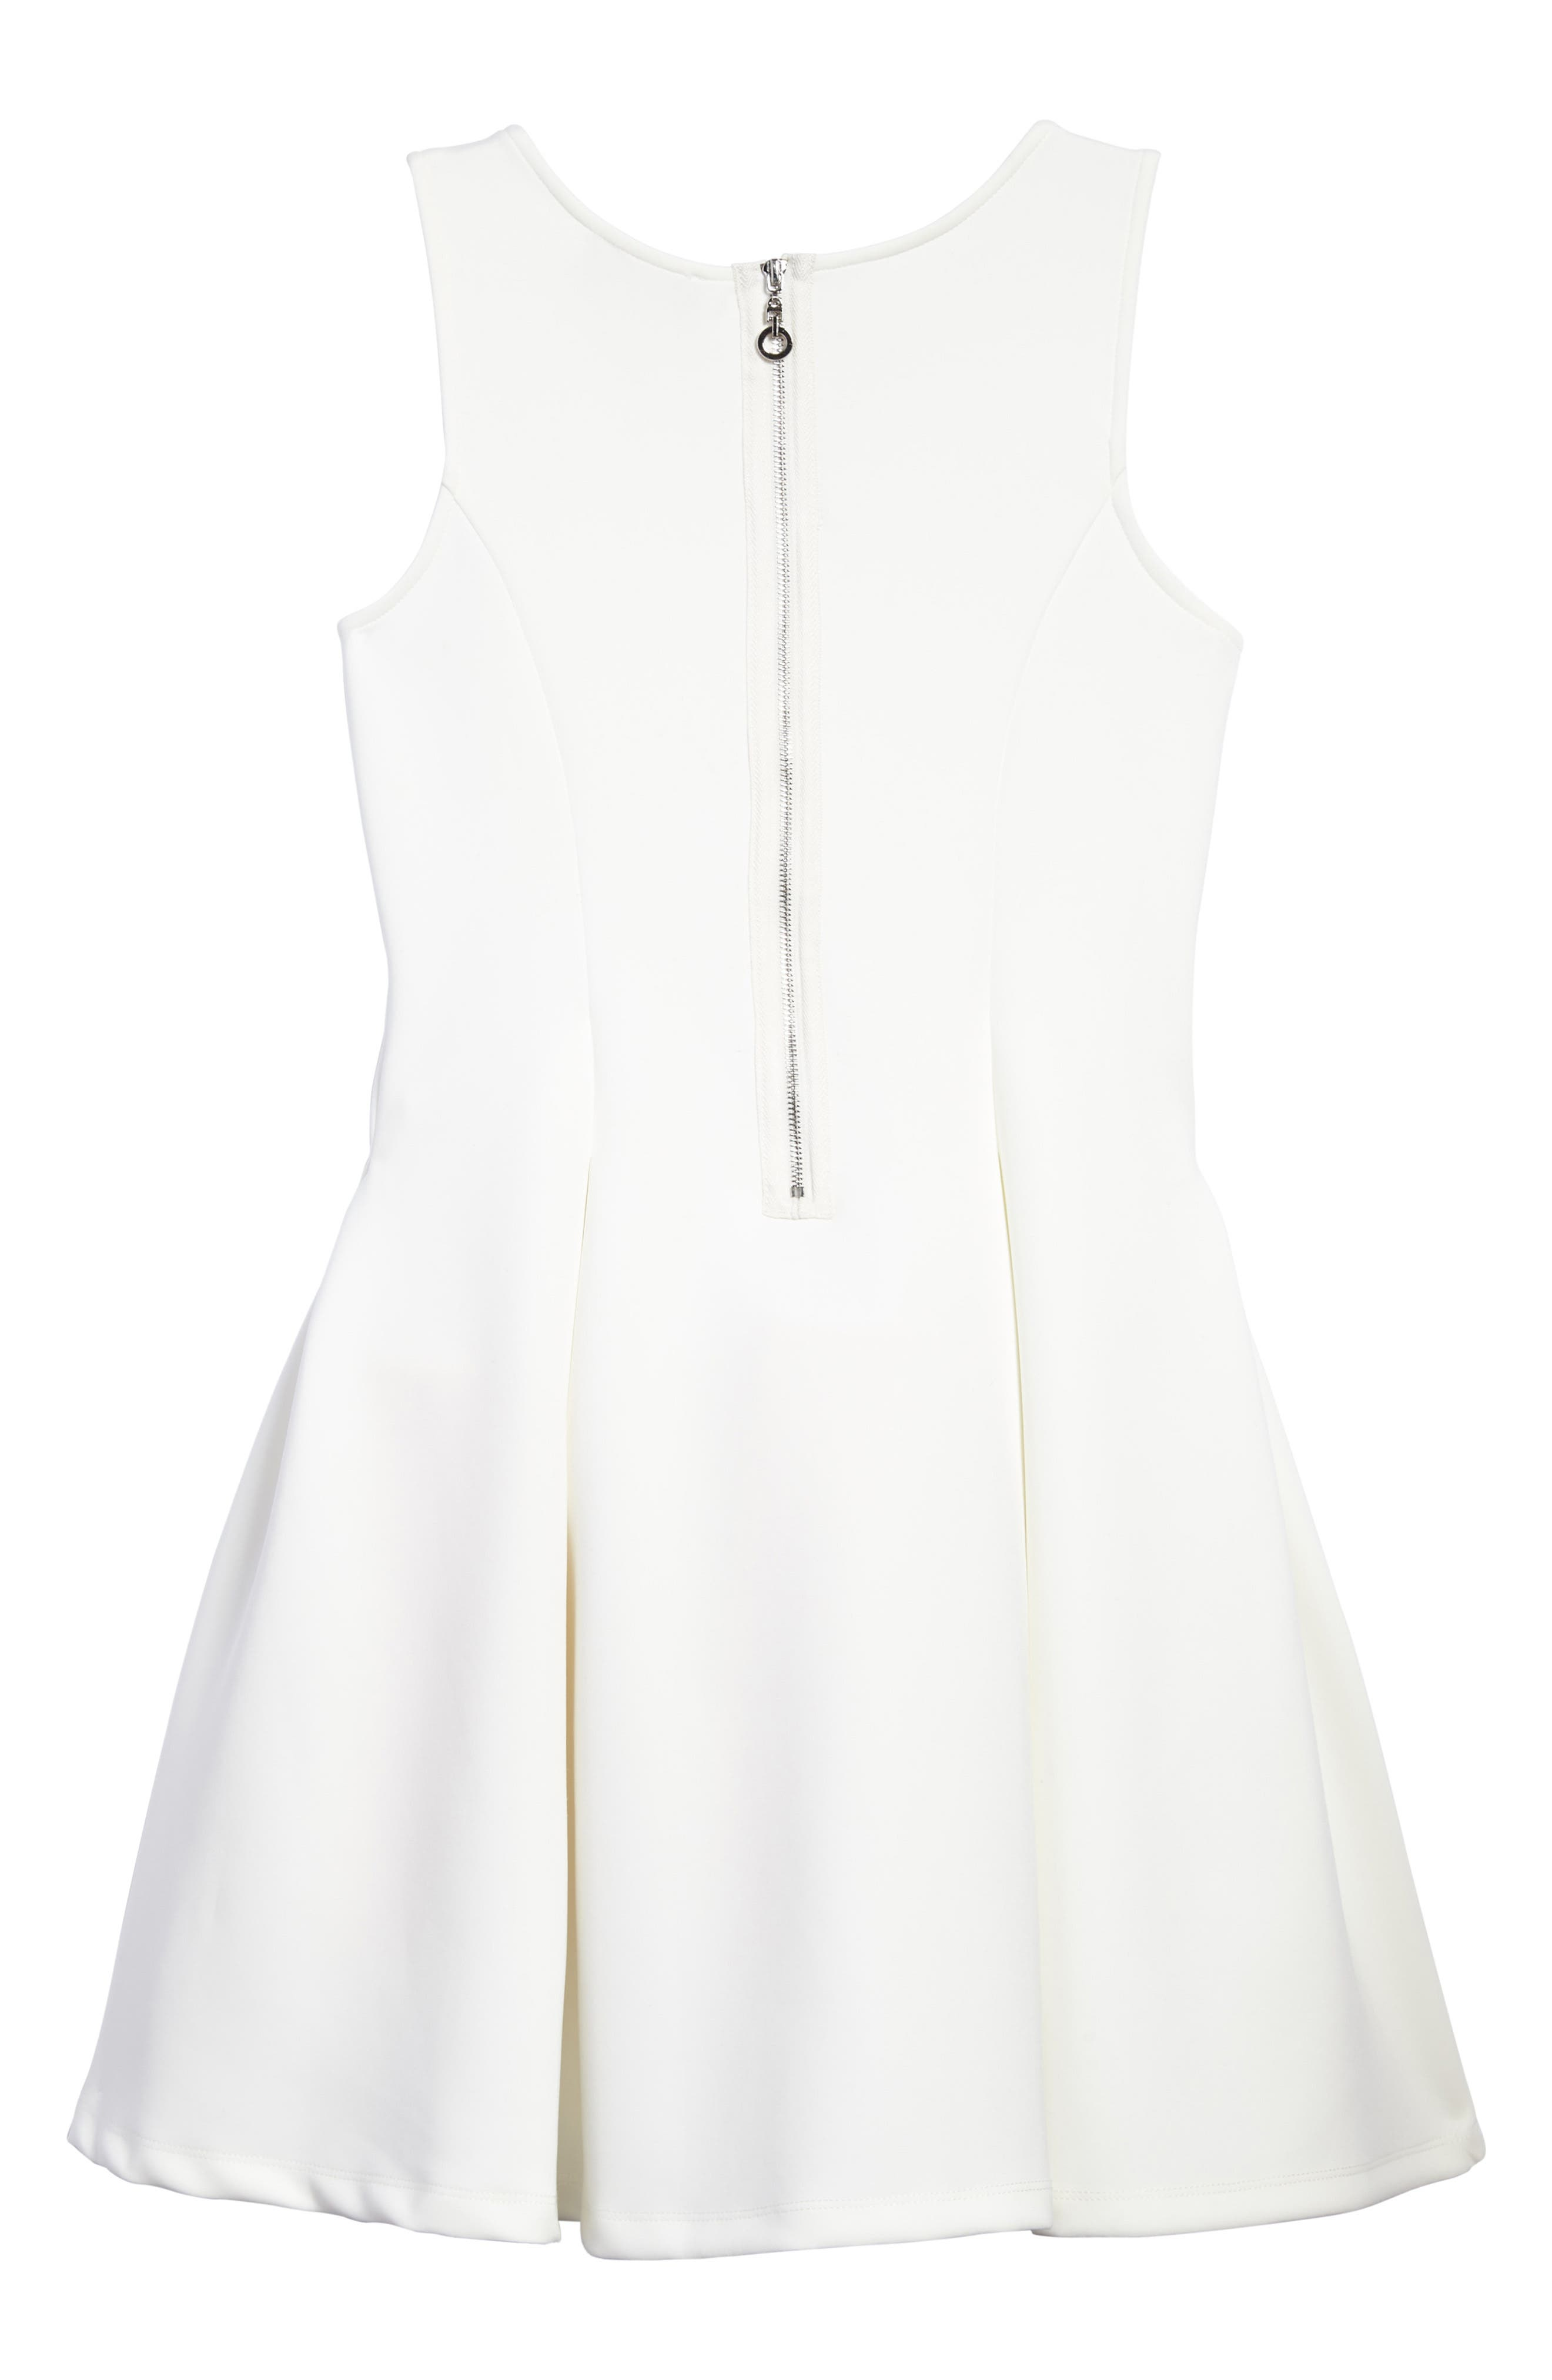 Sequin Embellished Bow A-Line Dress,                             Alternate thumbnail 2, color,                             250